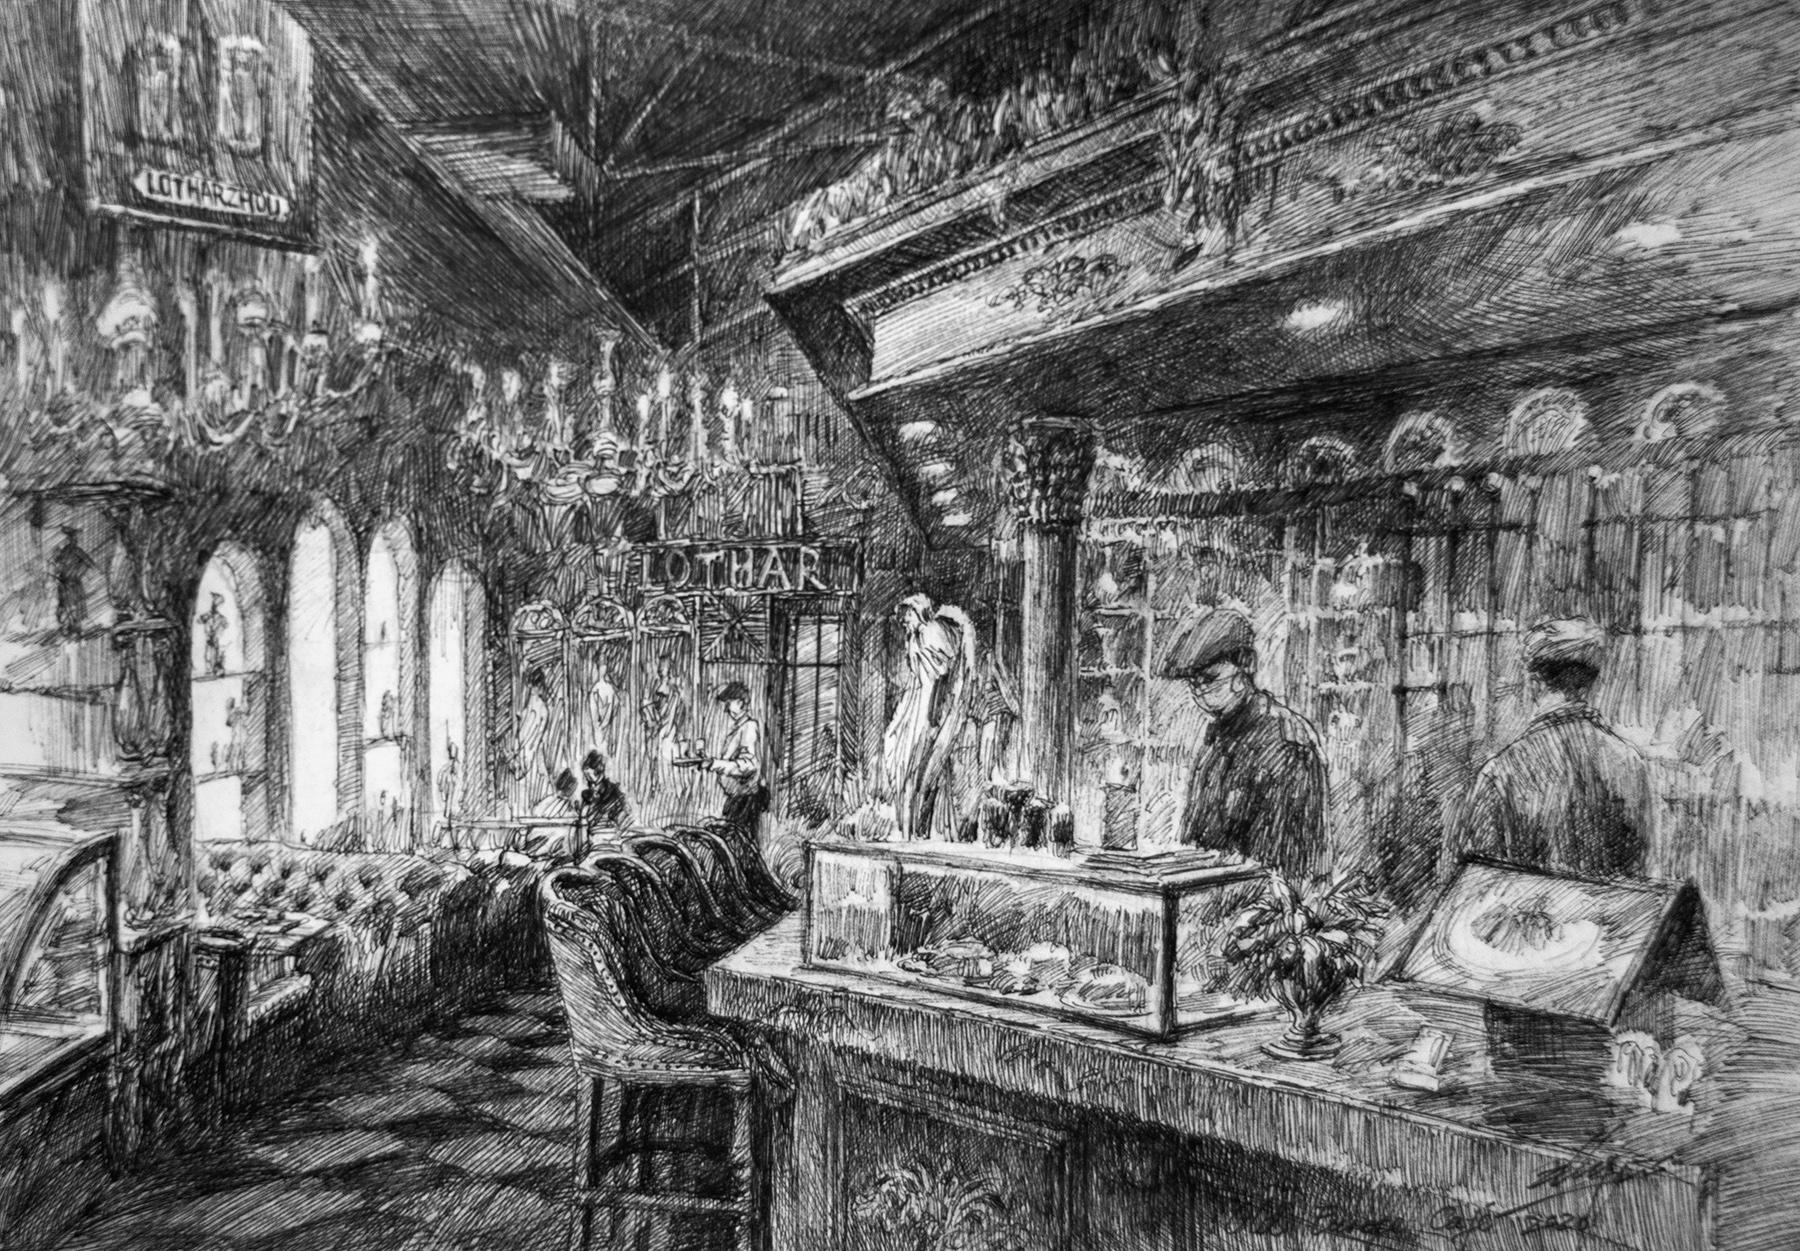 Old Europe Cafe